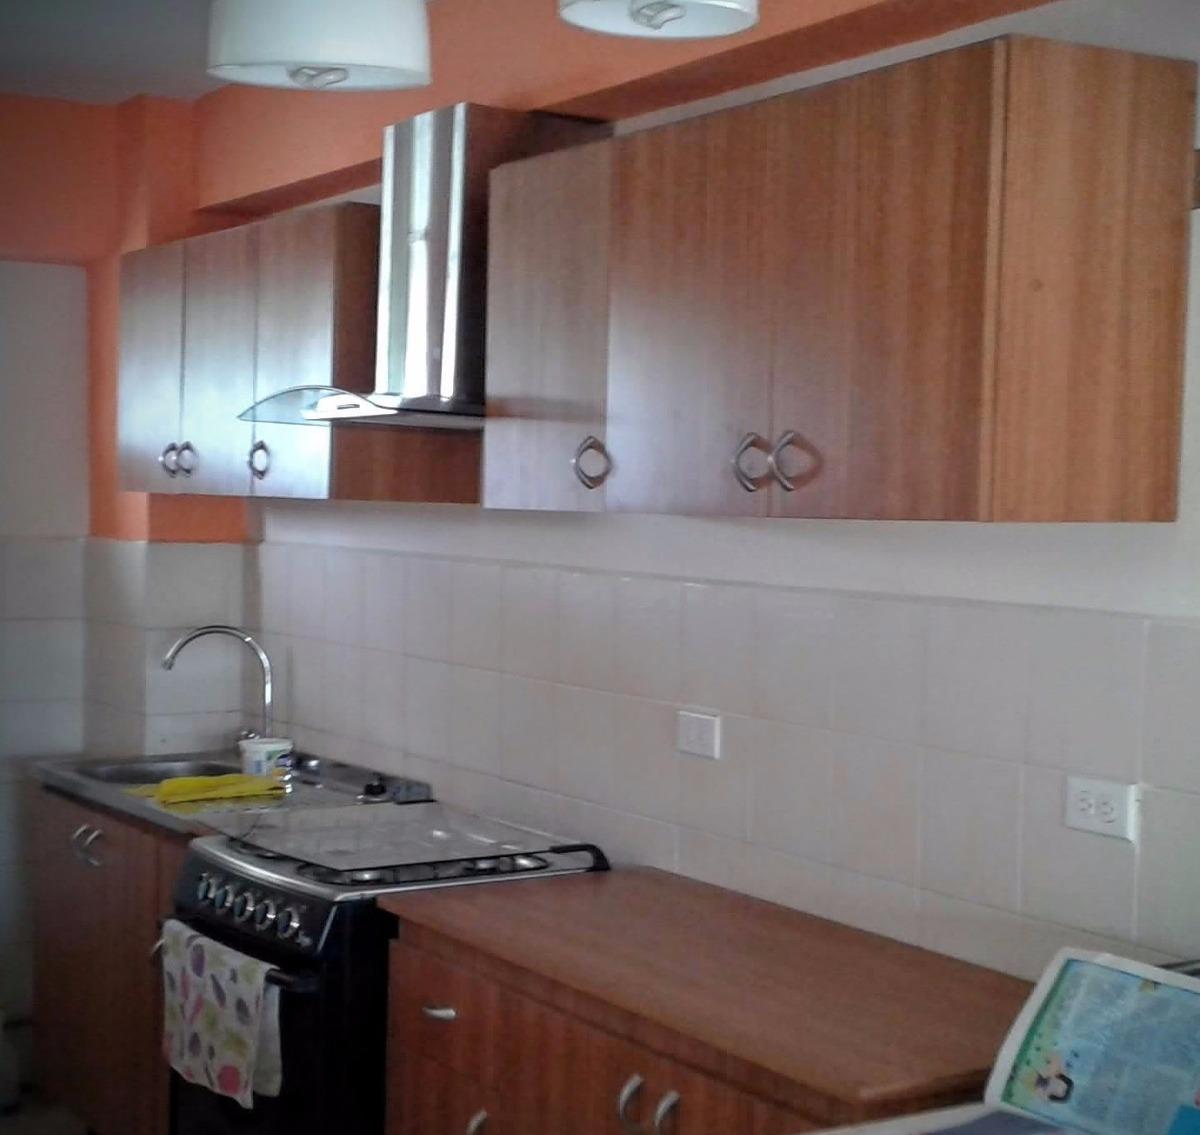 Mueble de cocina para fregadero de sobreponer de 120x50 for Mueble pared cocina